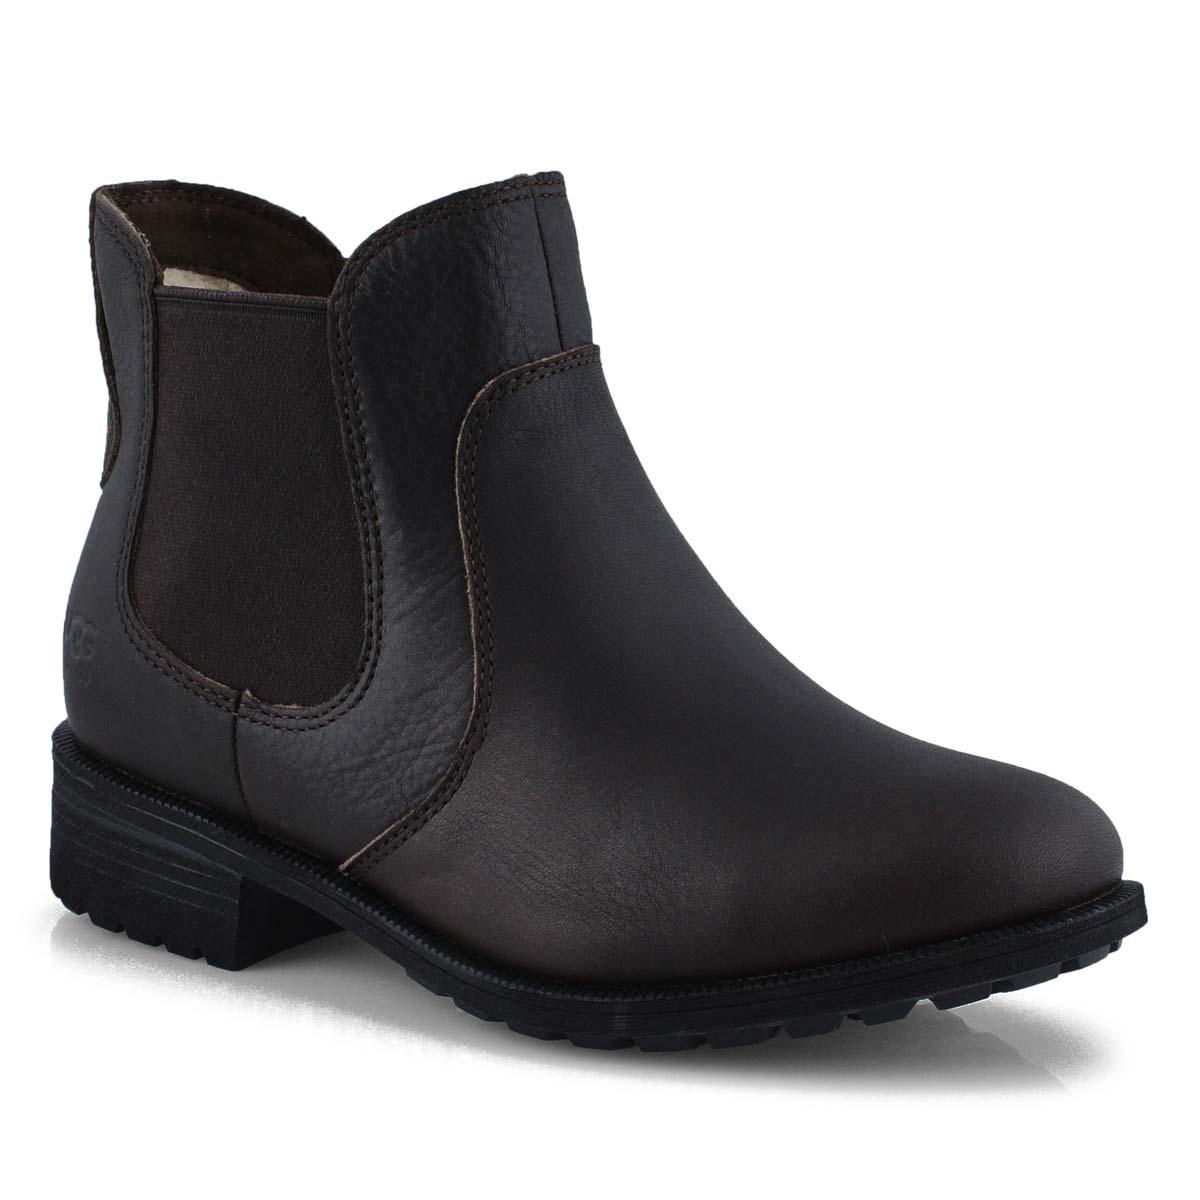 Lds Bonham III stout wtpf chelsea boot